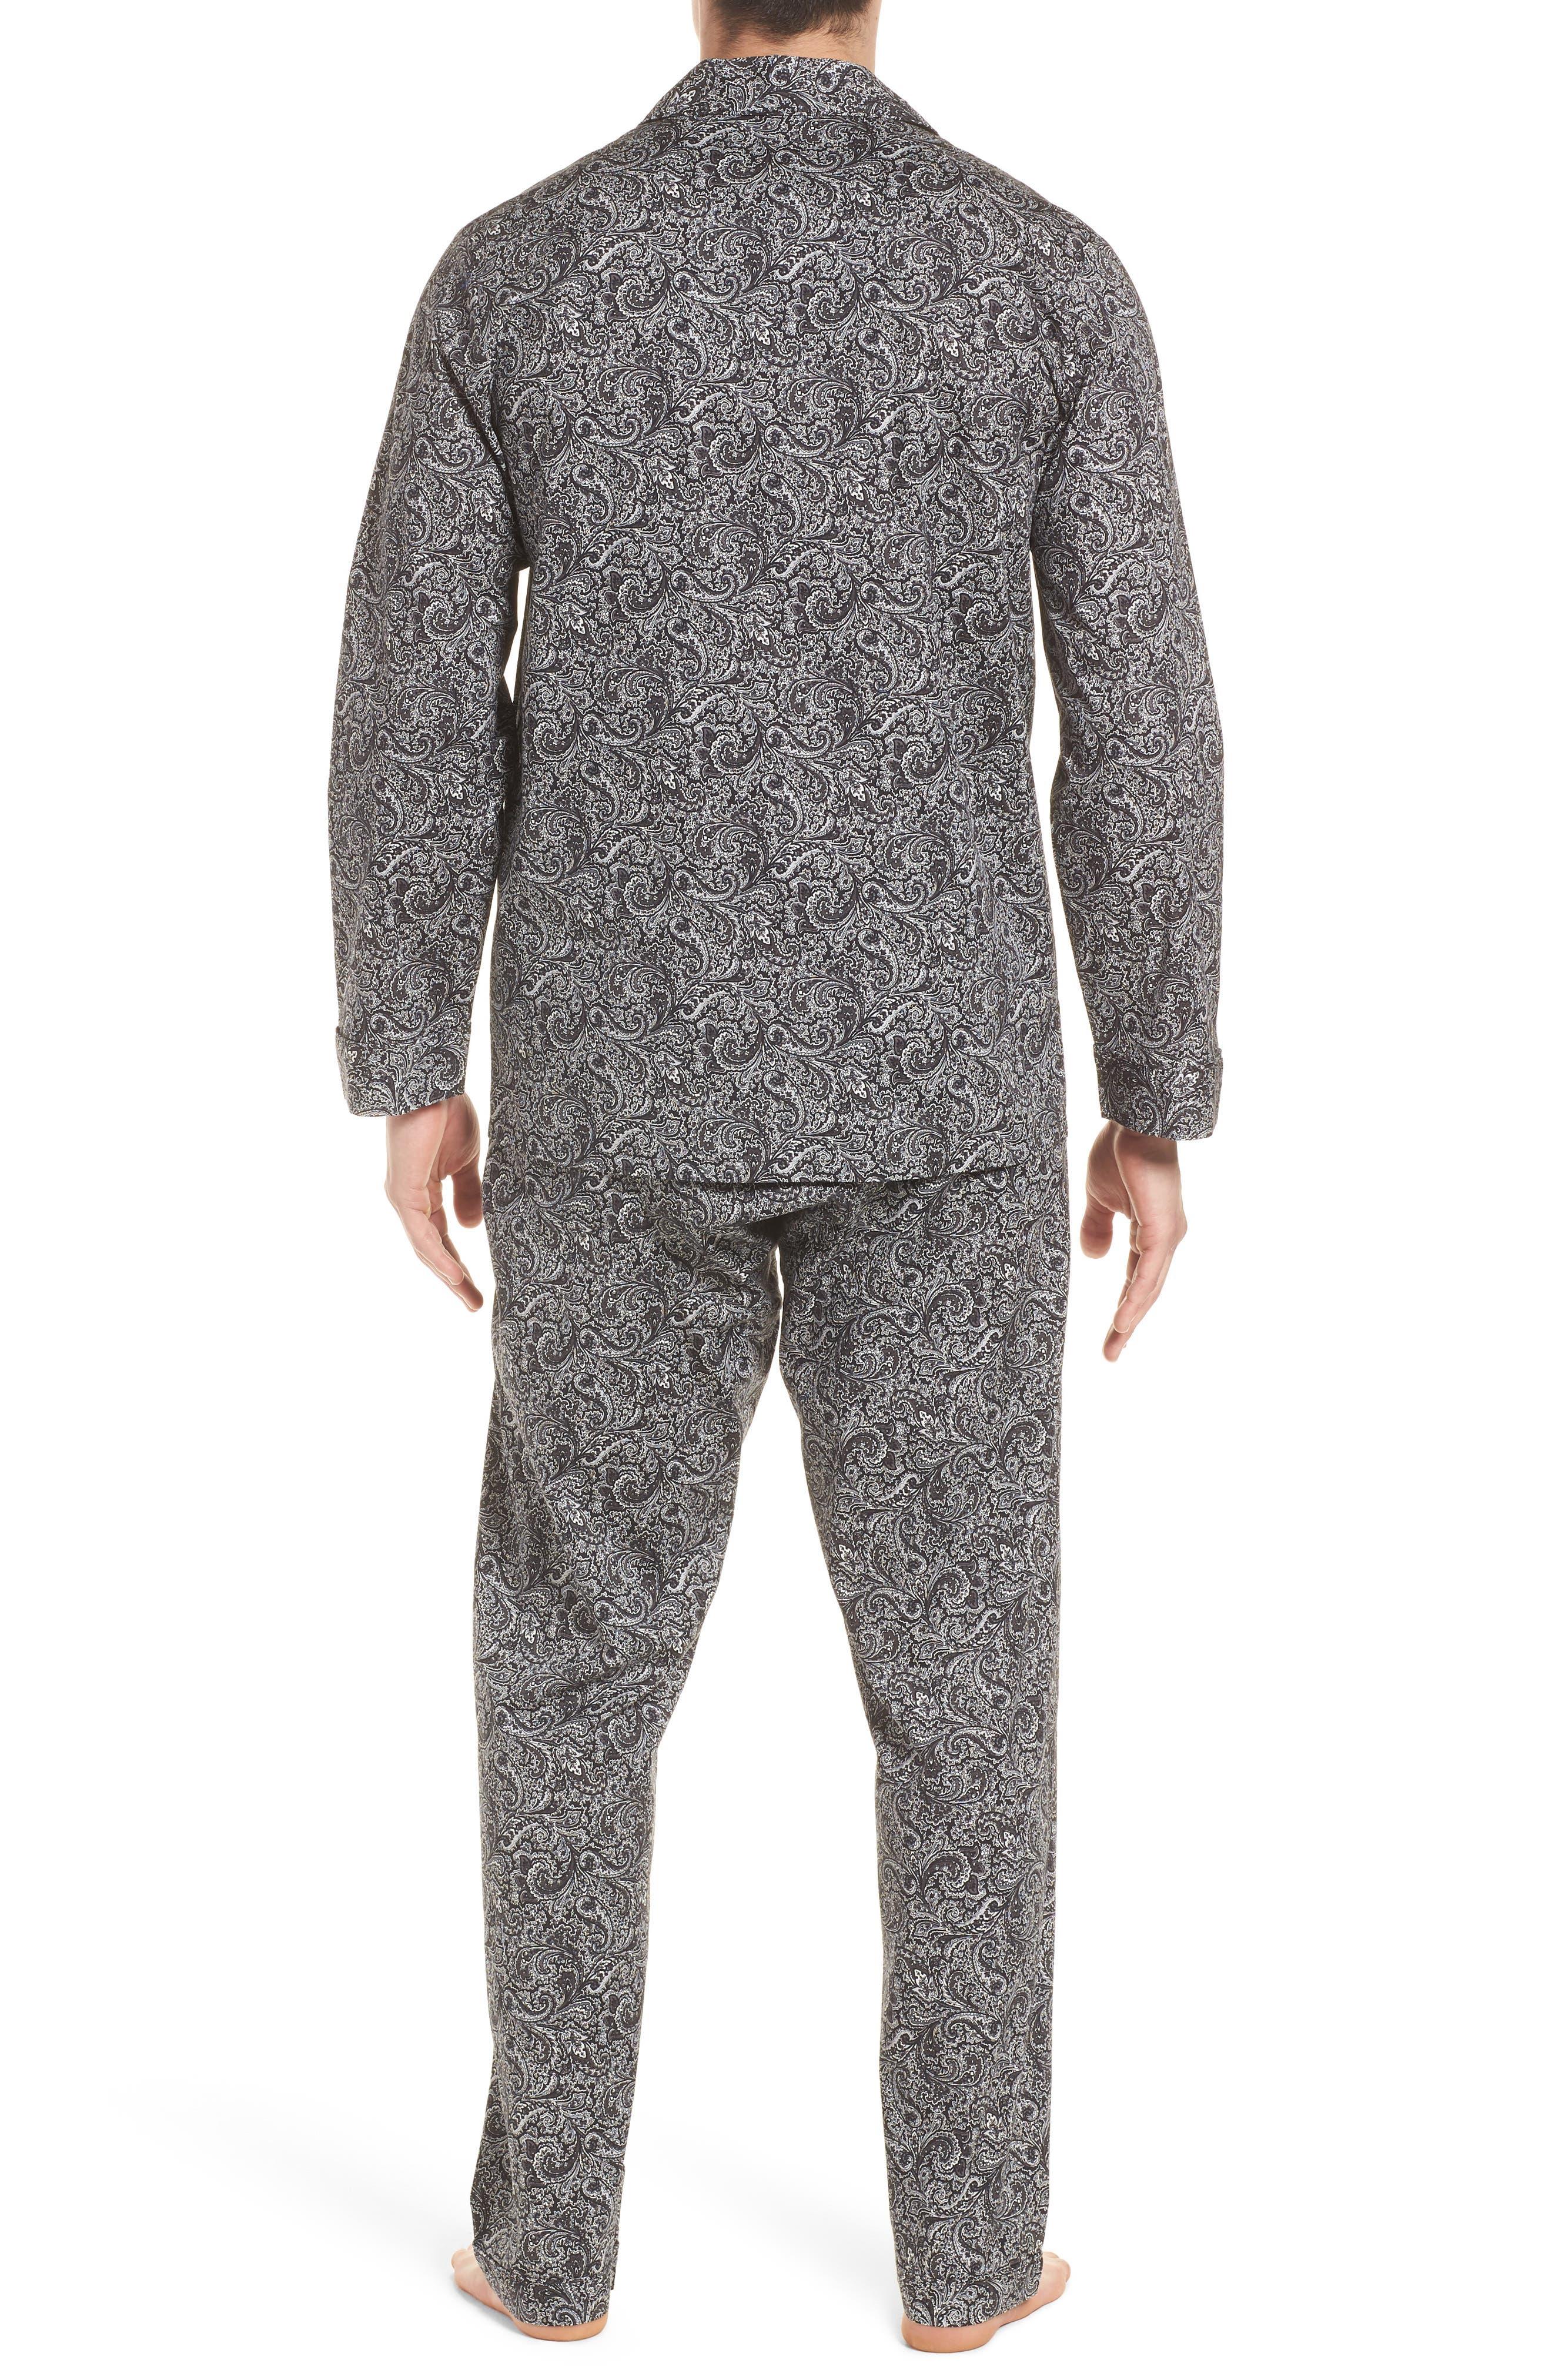 Starling Pajama Set,                             Alternate thumbnail 2, color,                             BLACK PAISLEY